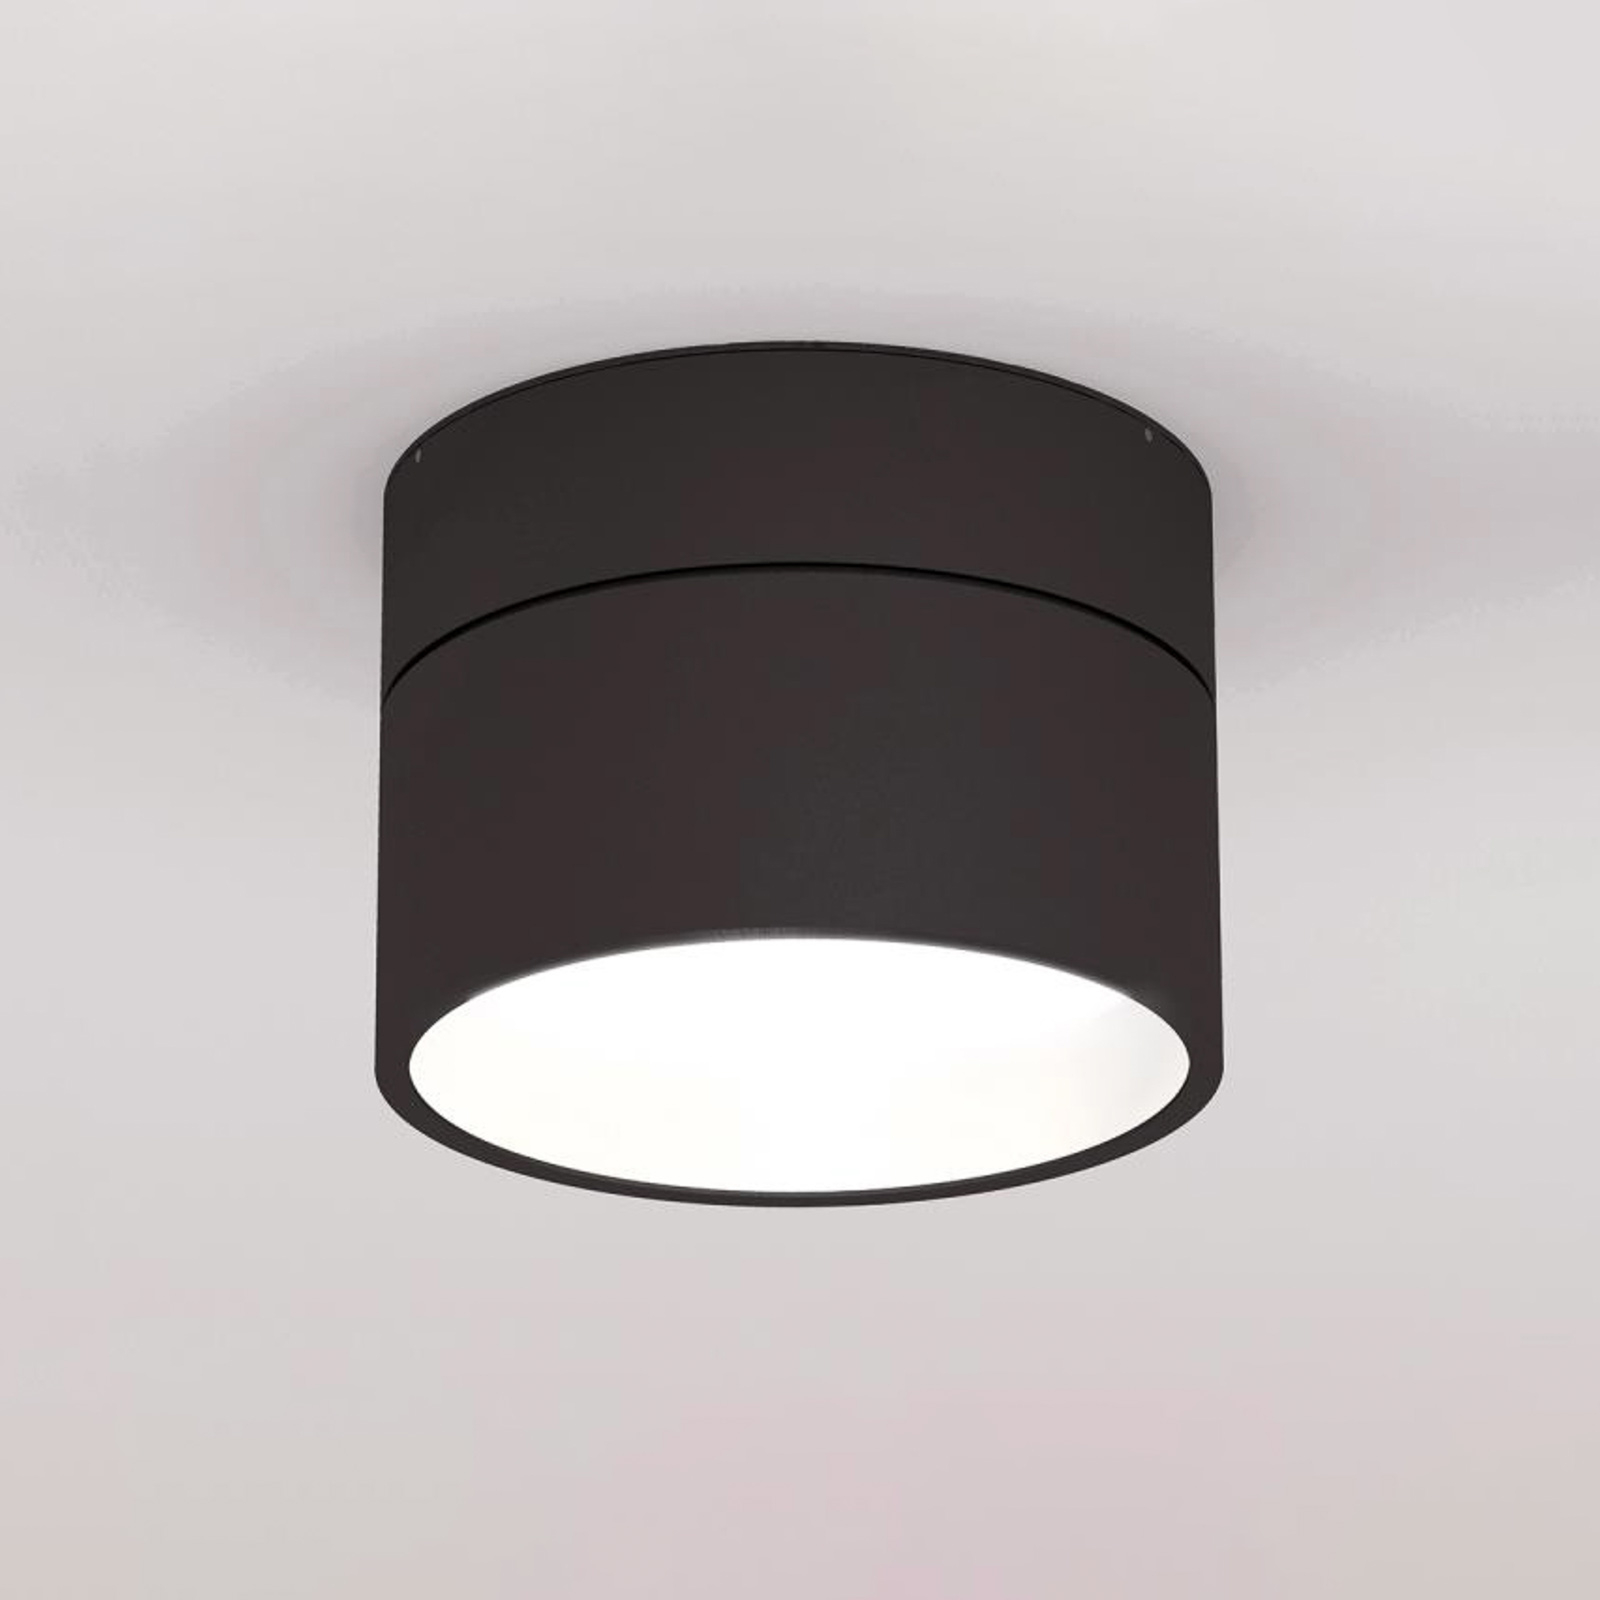 LOUM Turn on LED-taklampa dim 2700K svart/vit